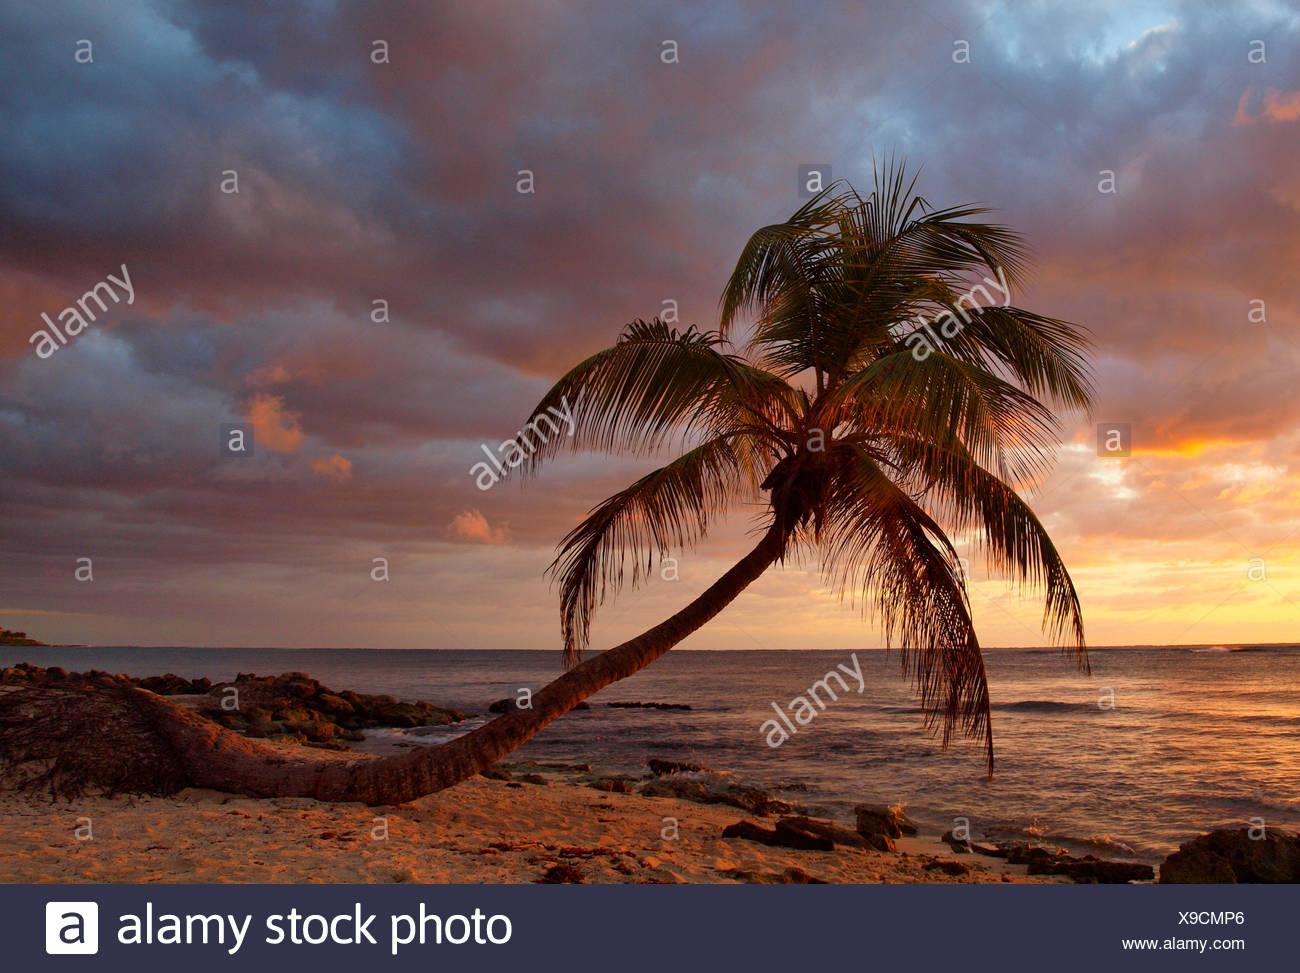 palm by the ocean in evening glow, Mexico, Yucatan, Caribbean Sea, Akumal - Stock Image